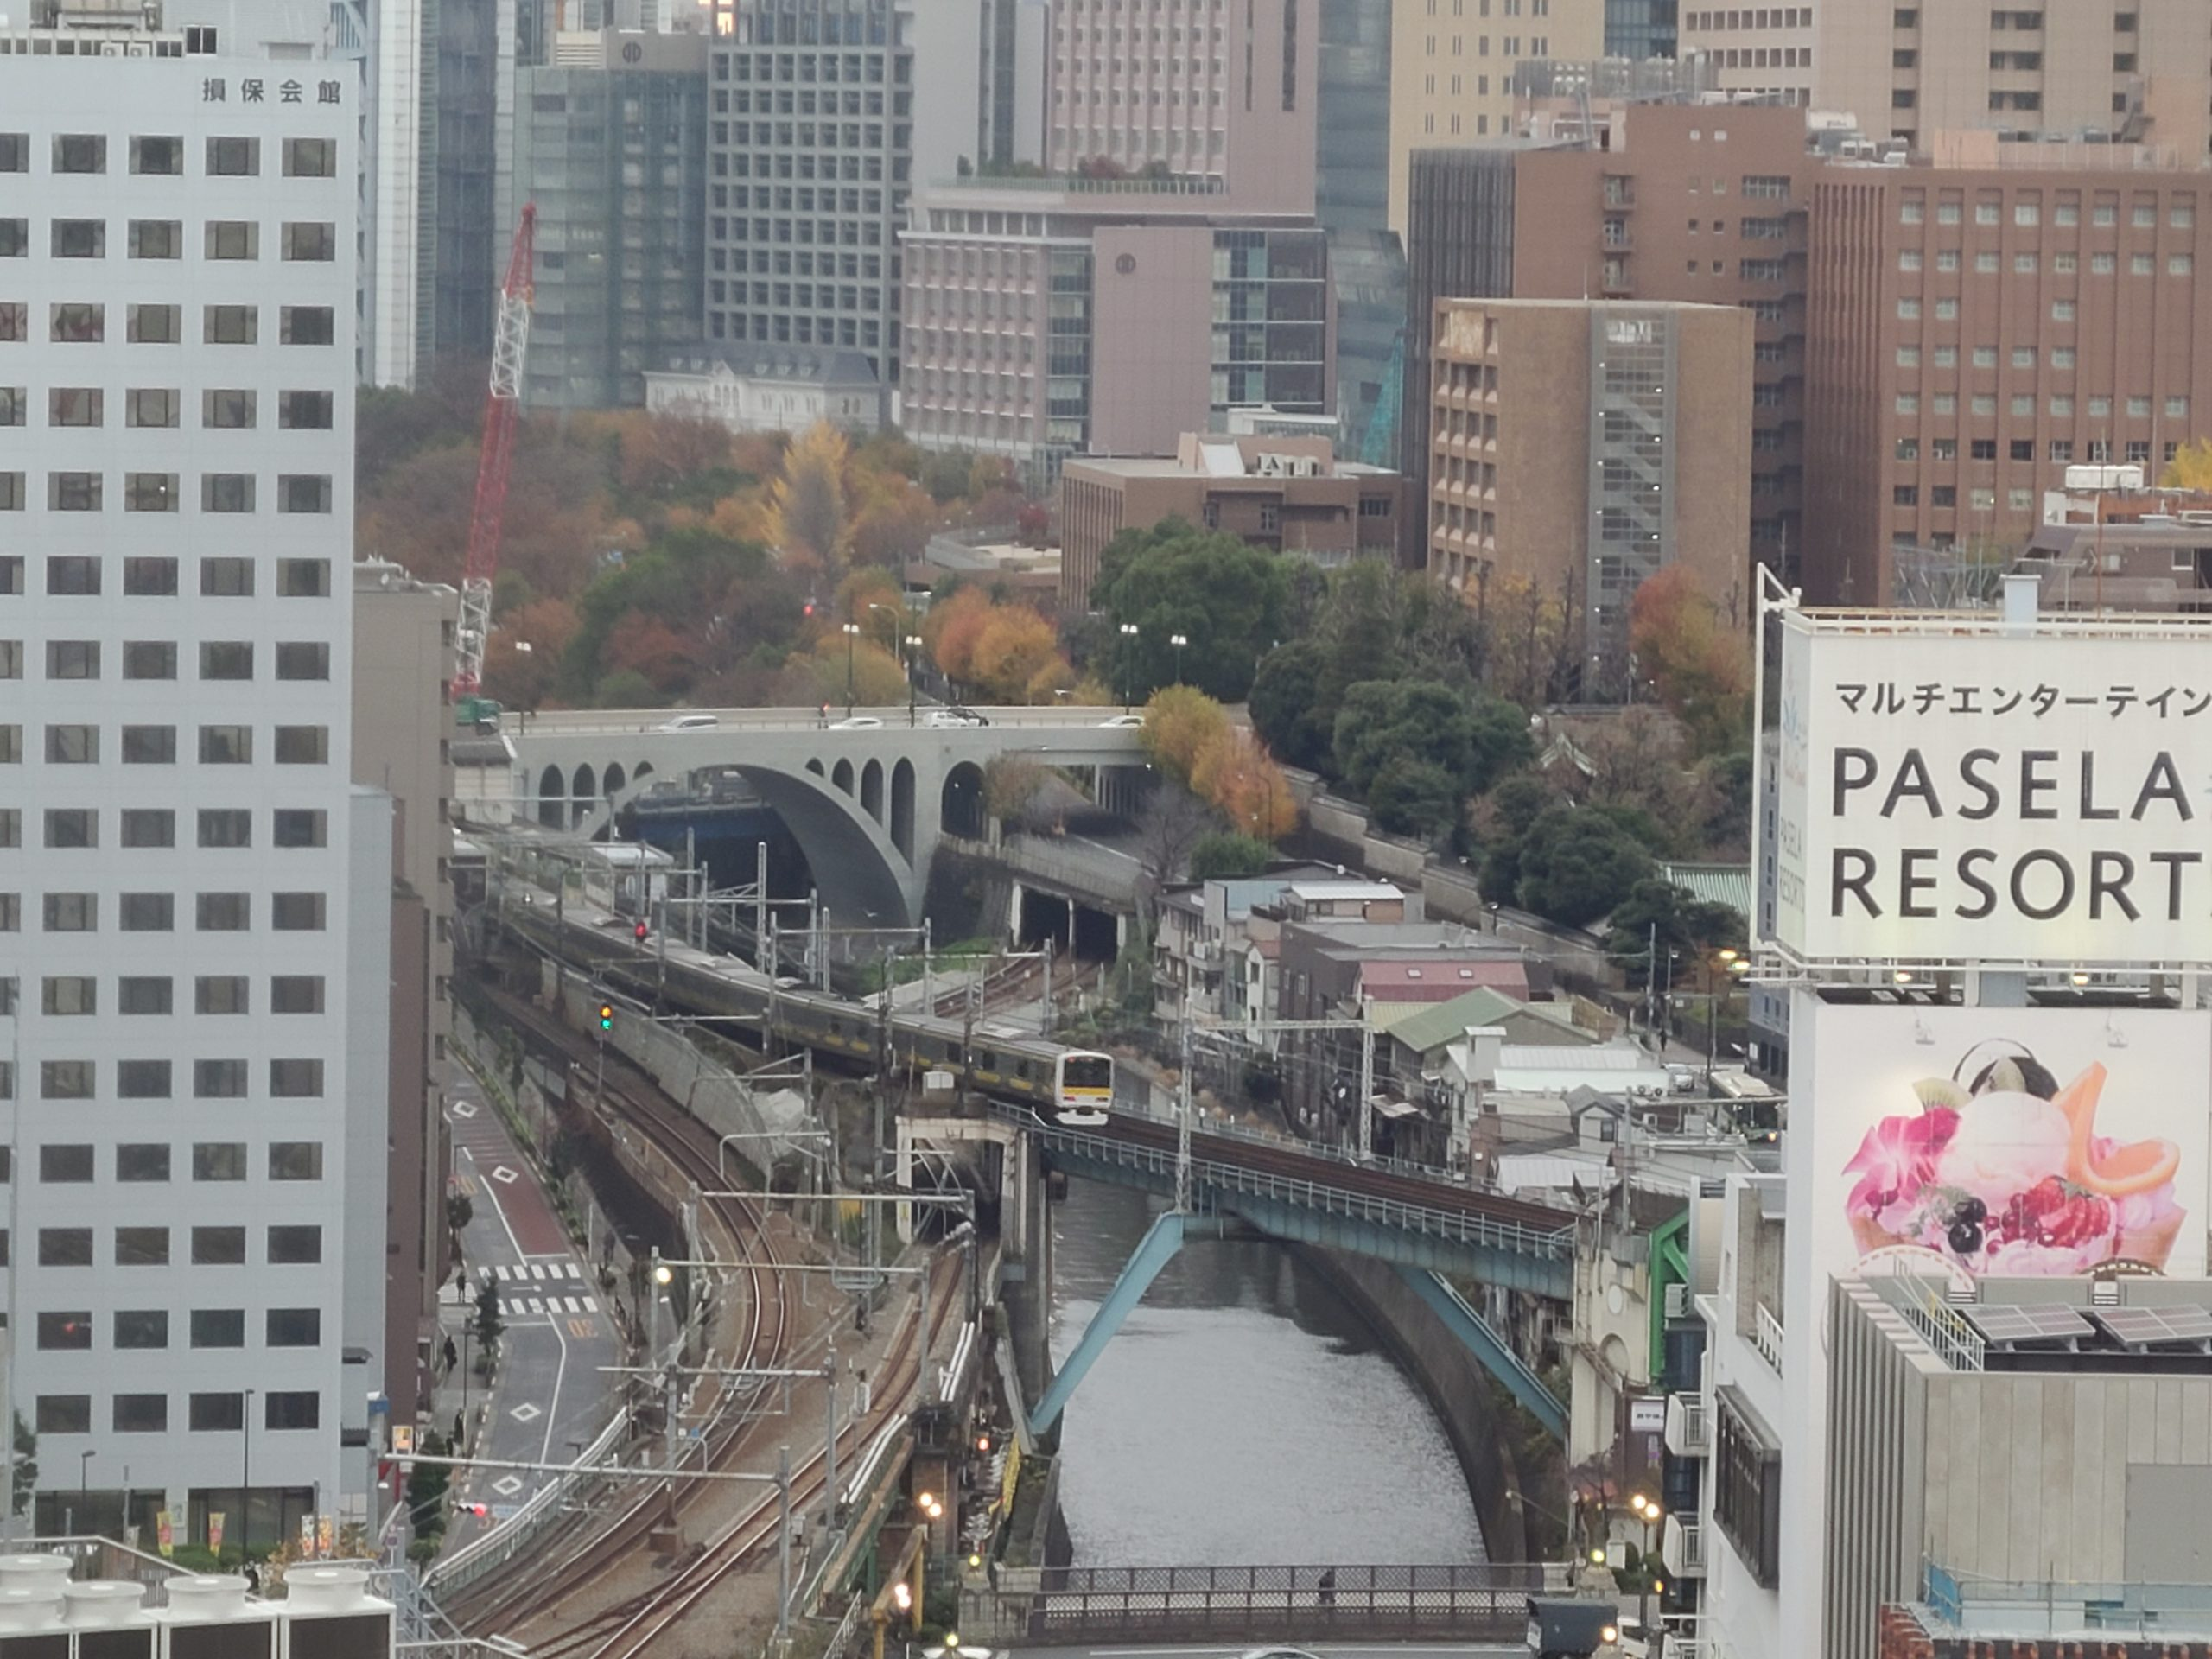 【JR西日本のホテル】ヴィアイン秋葉原に泊まってみた 客室から撮り鉄・旧万世橋駅近く